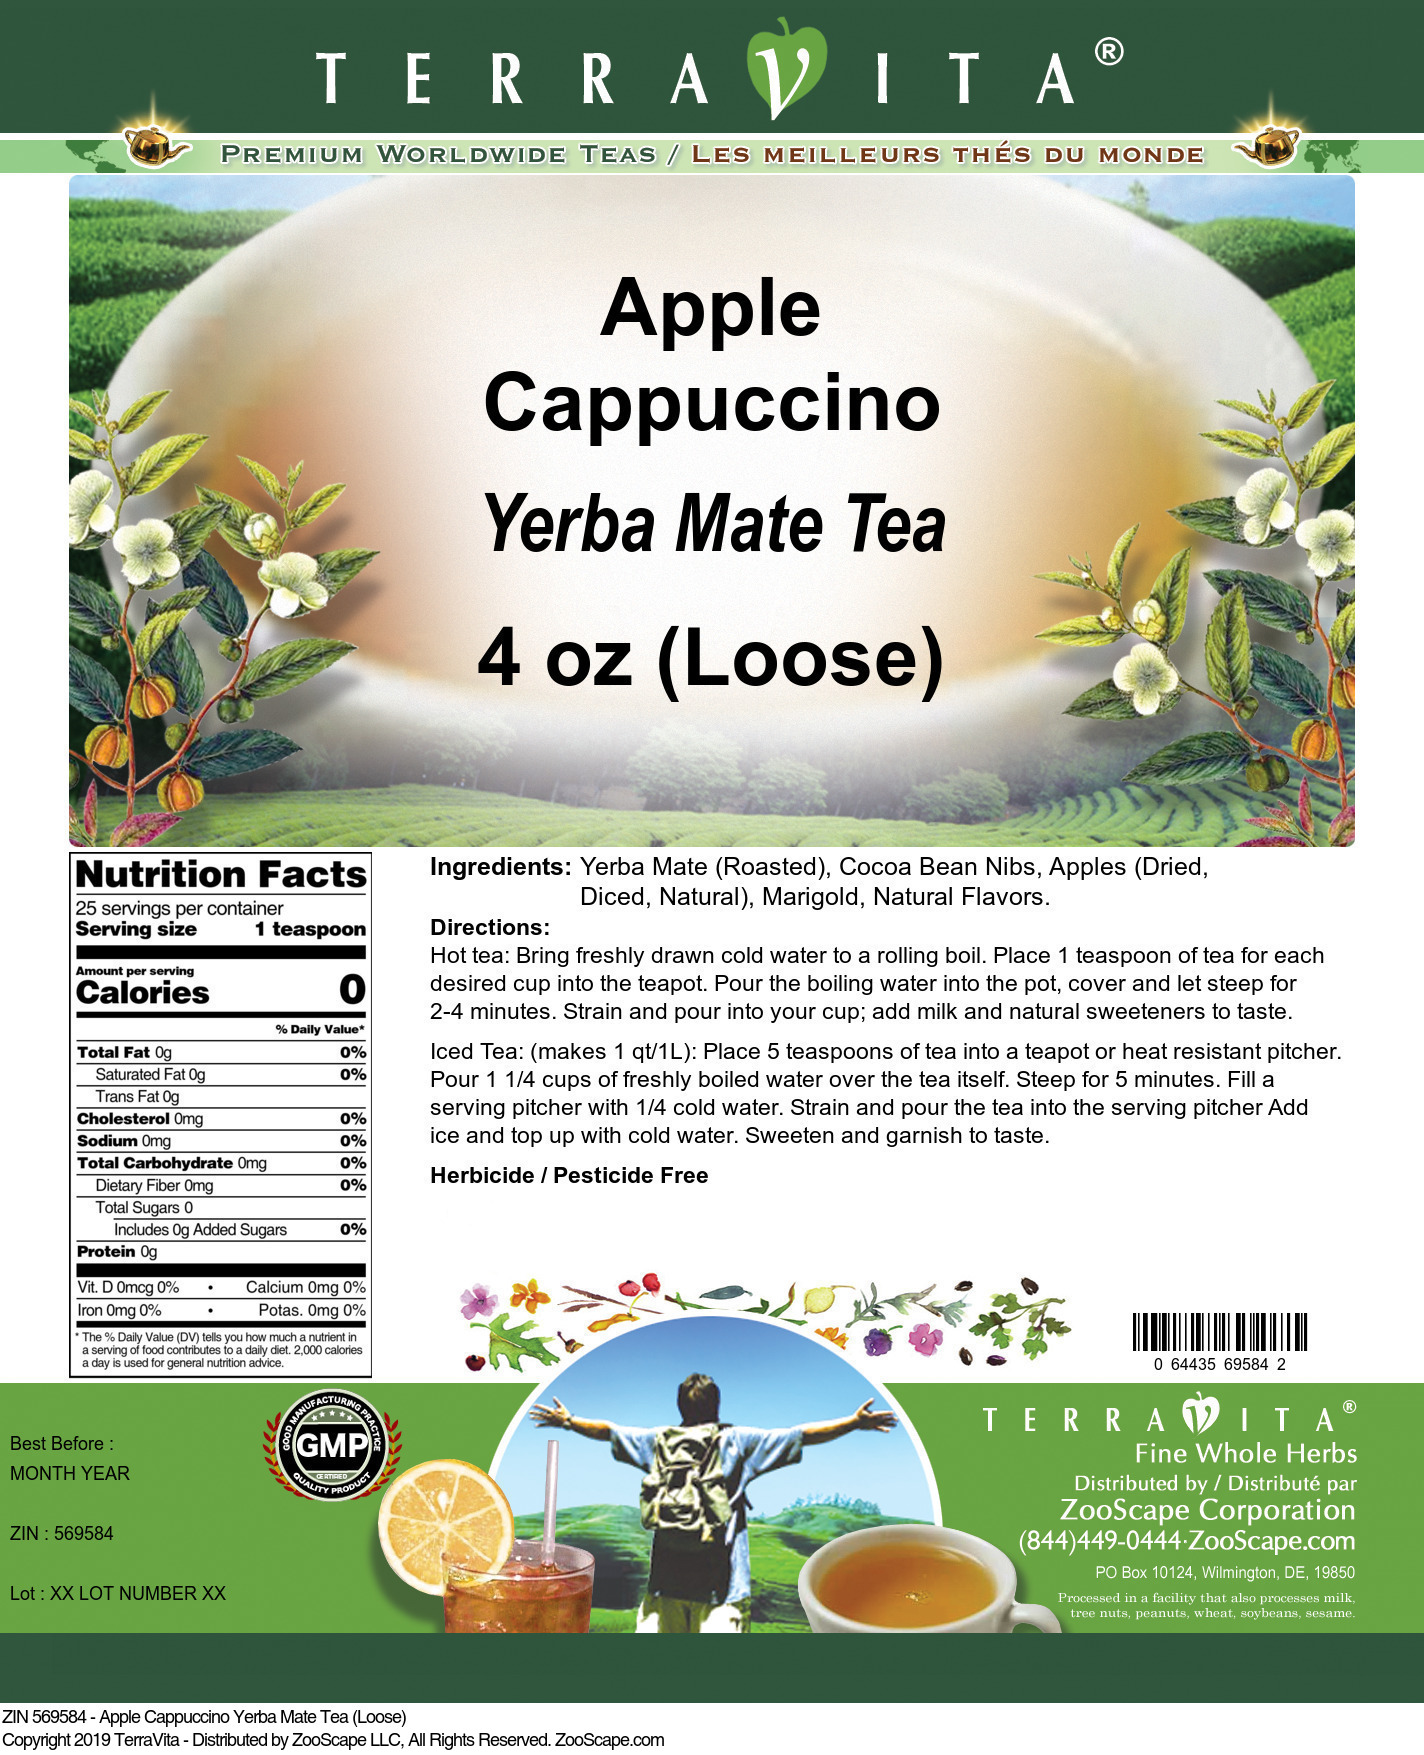 Apple Cappuccino Yerba Mate